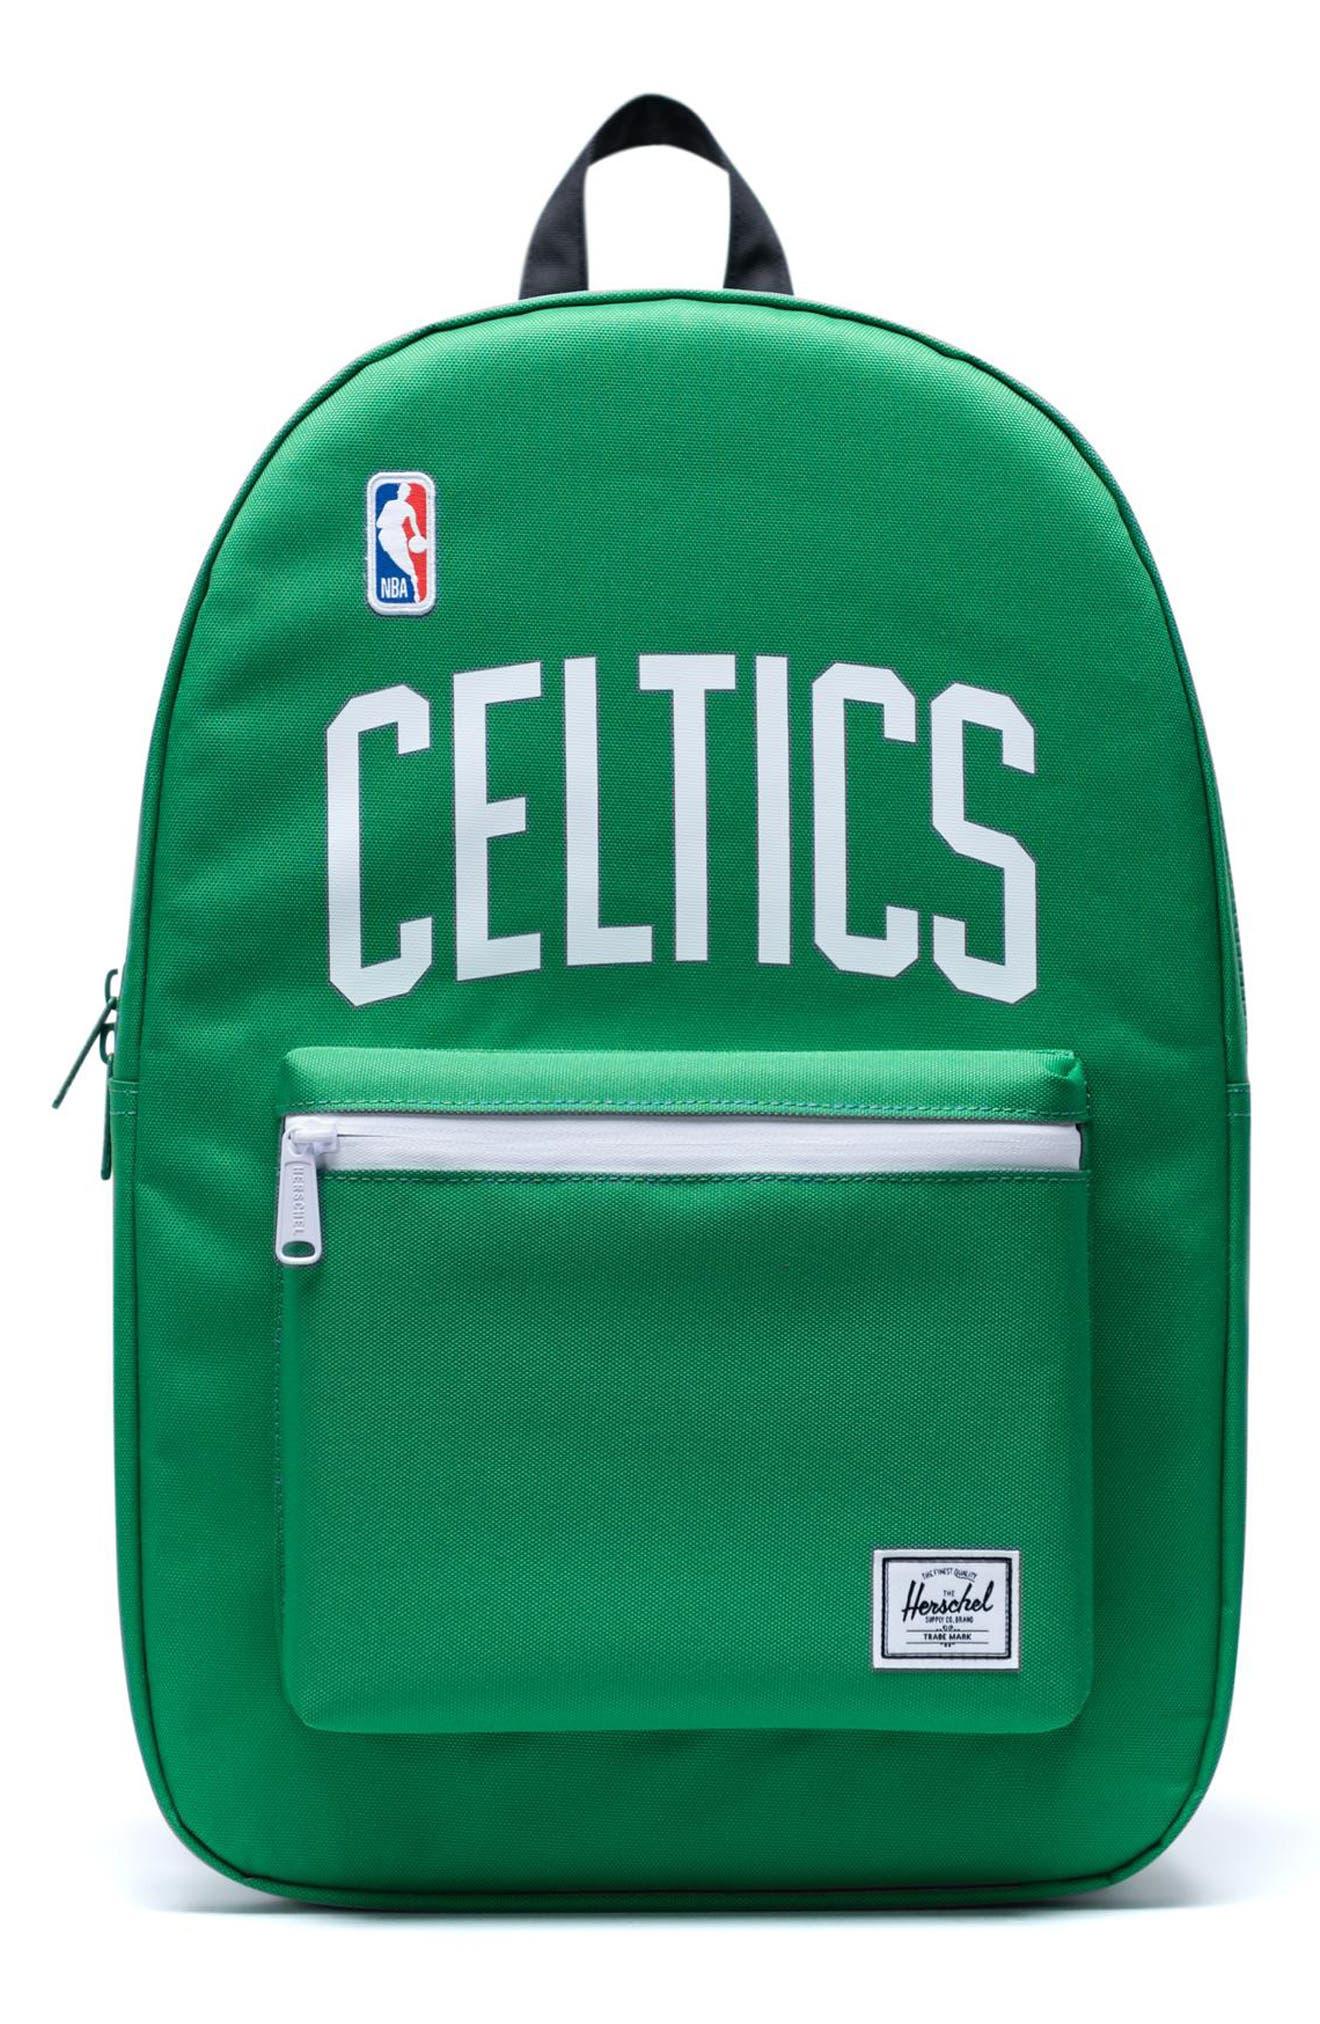 Herschel Supply Co. Settlement Nba Champions 15-Inch Laptop Backpack - Green